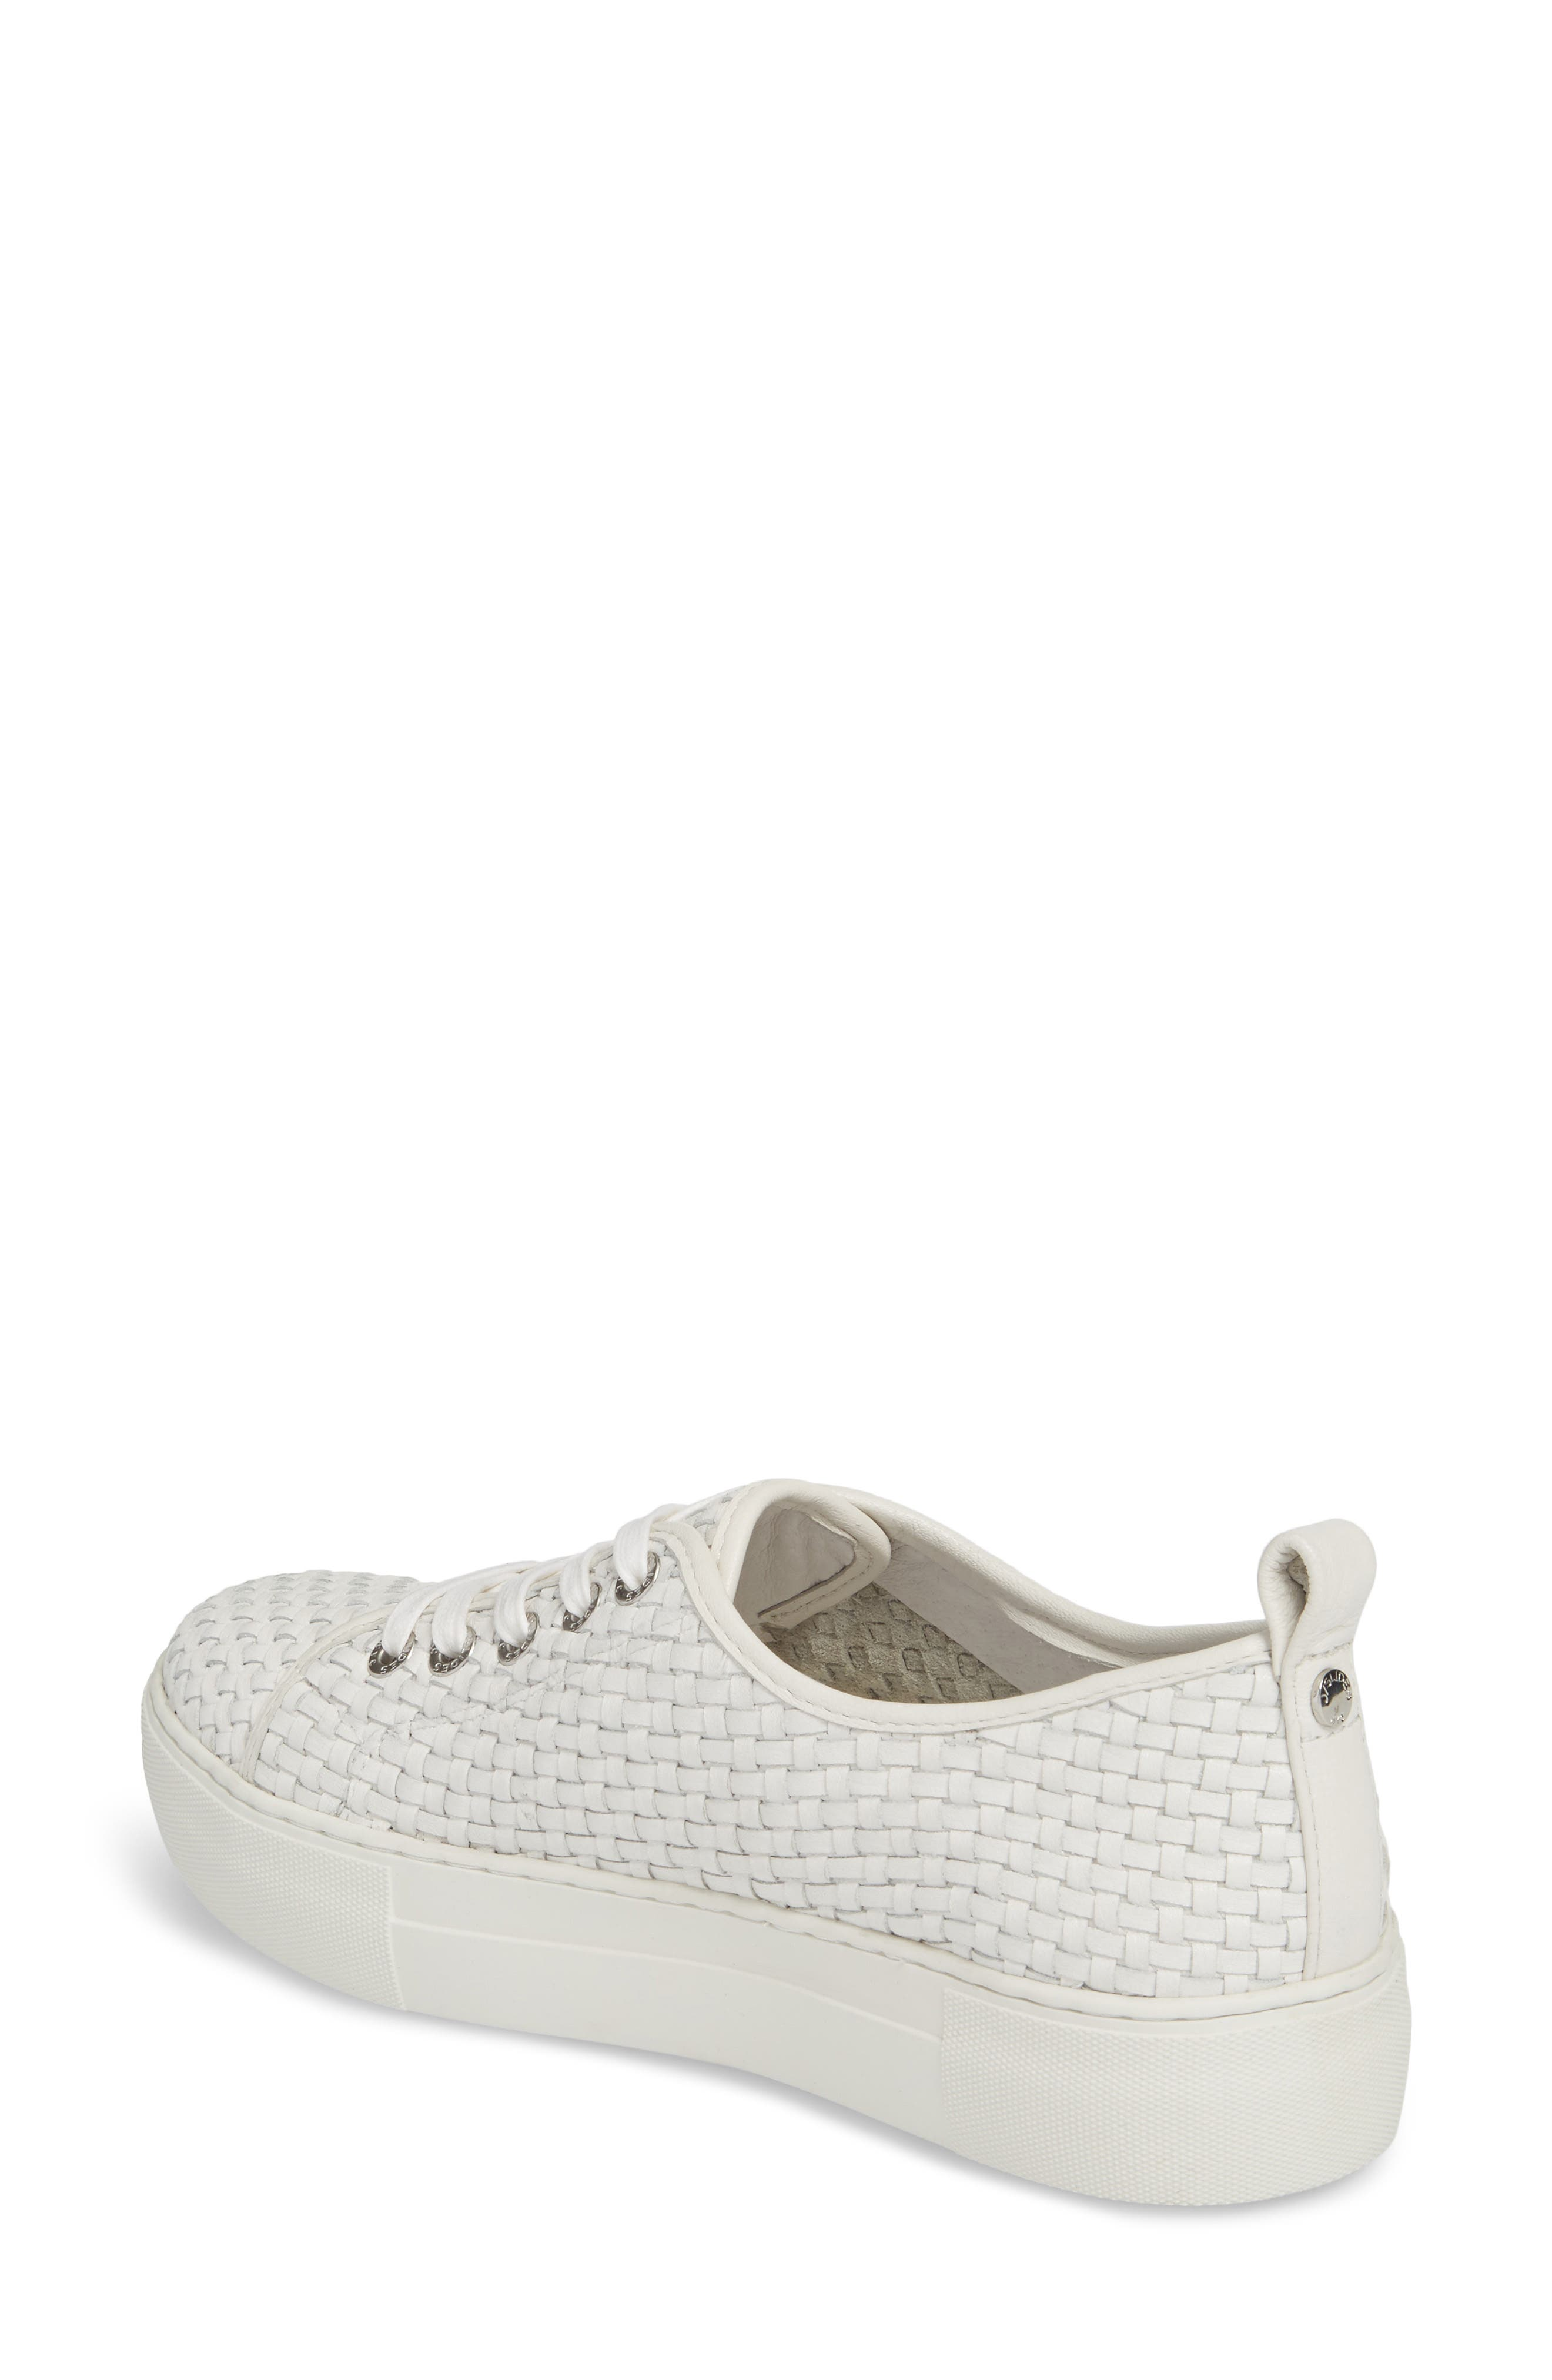 Artsy Woven Platform Sneaker,                             Alternate thumbnail 2, color,                             White Leather